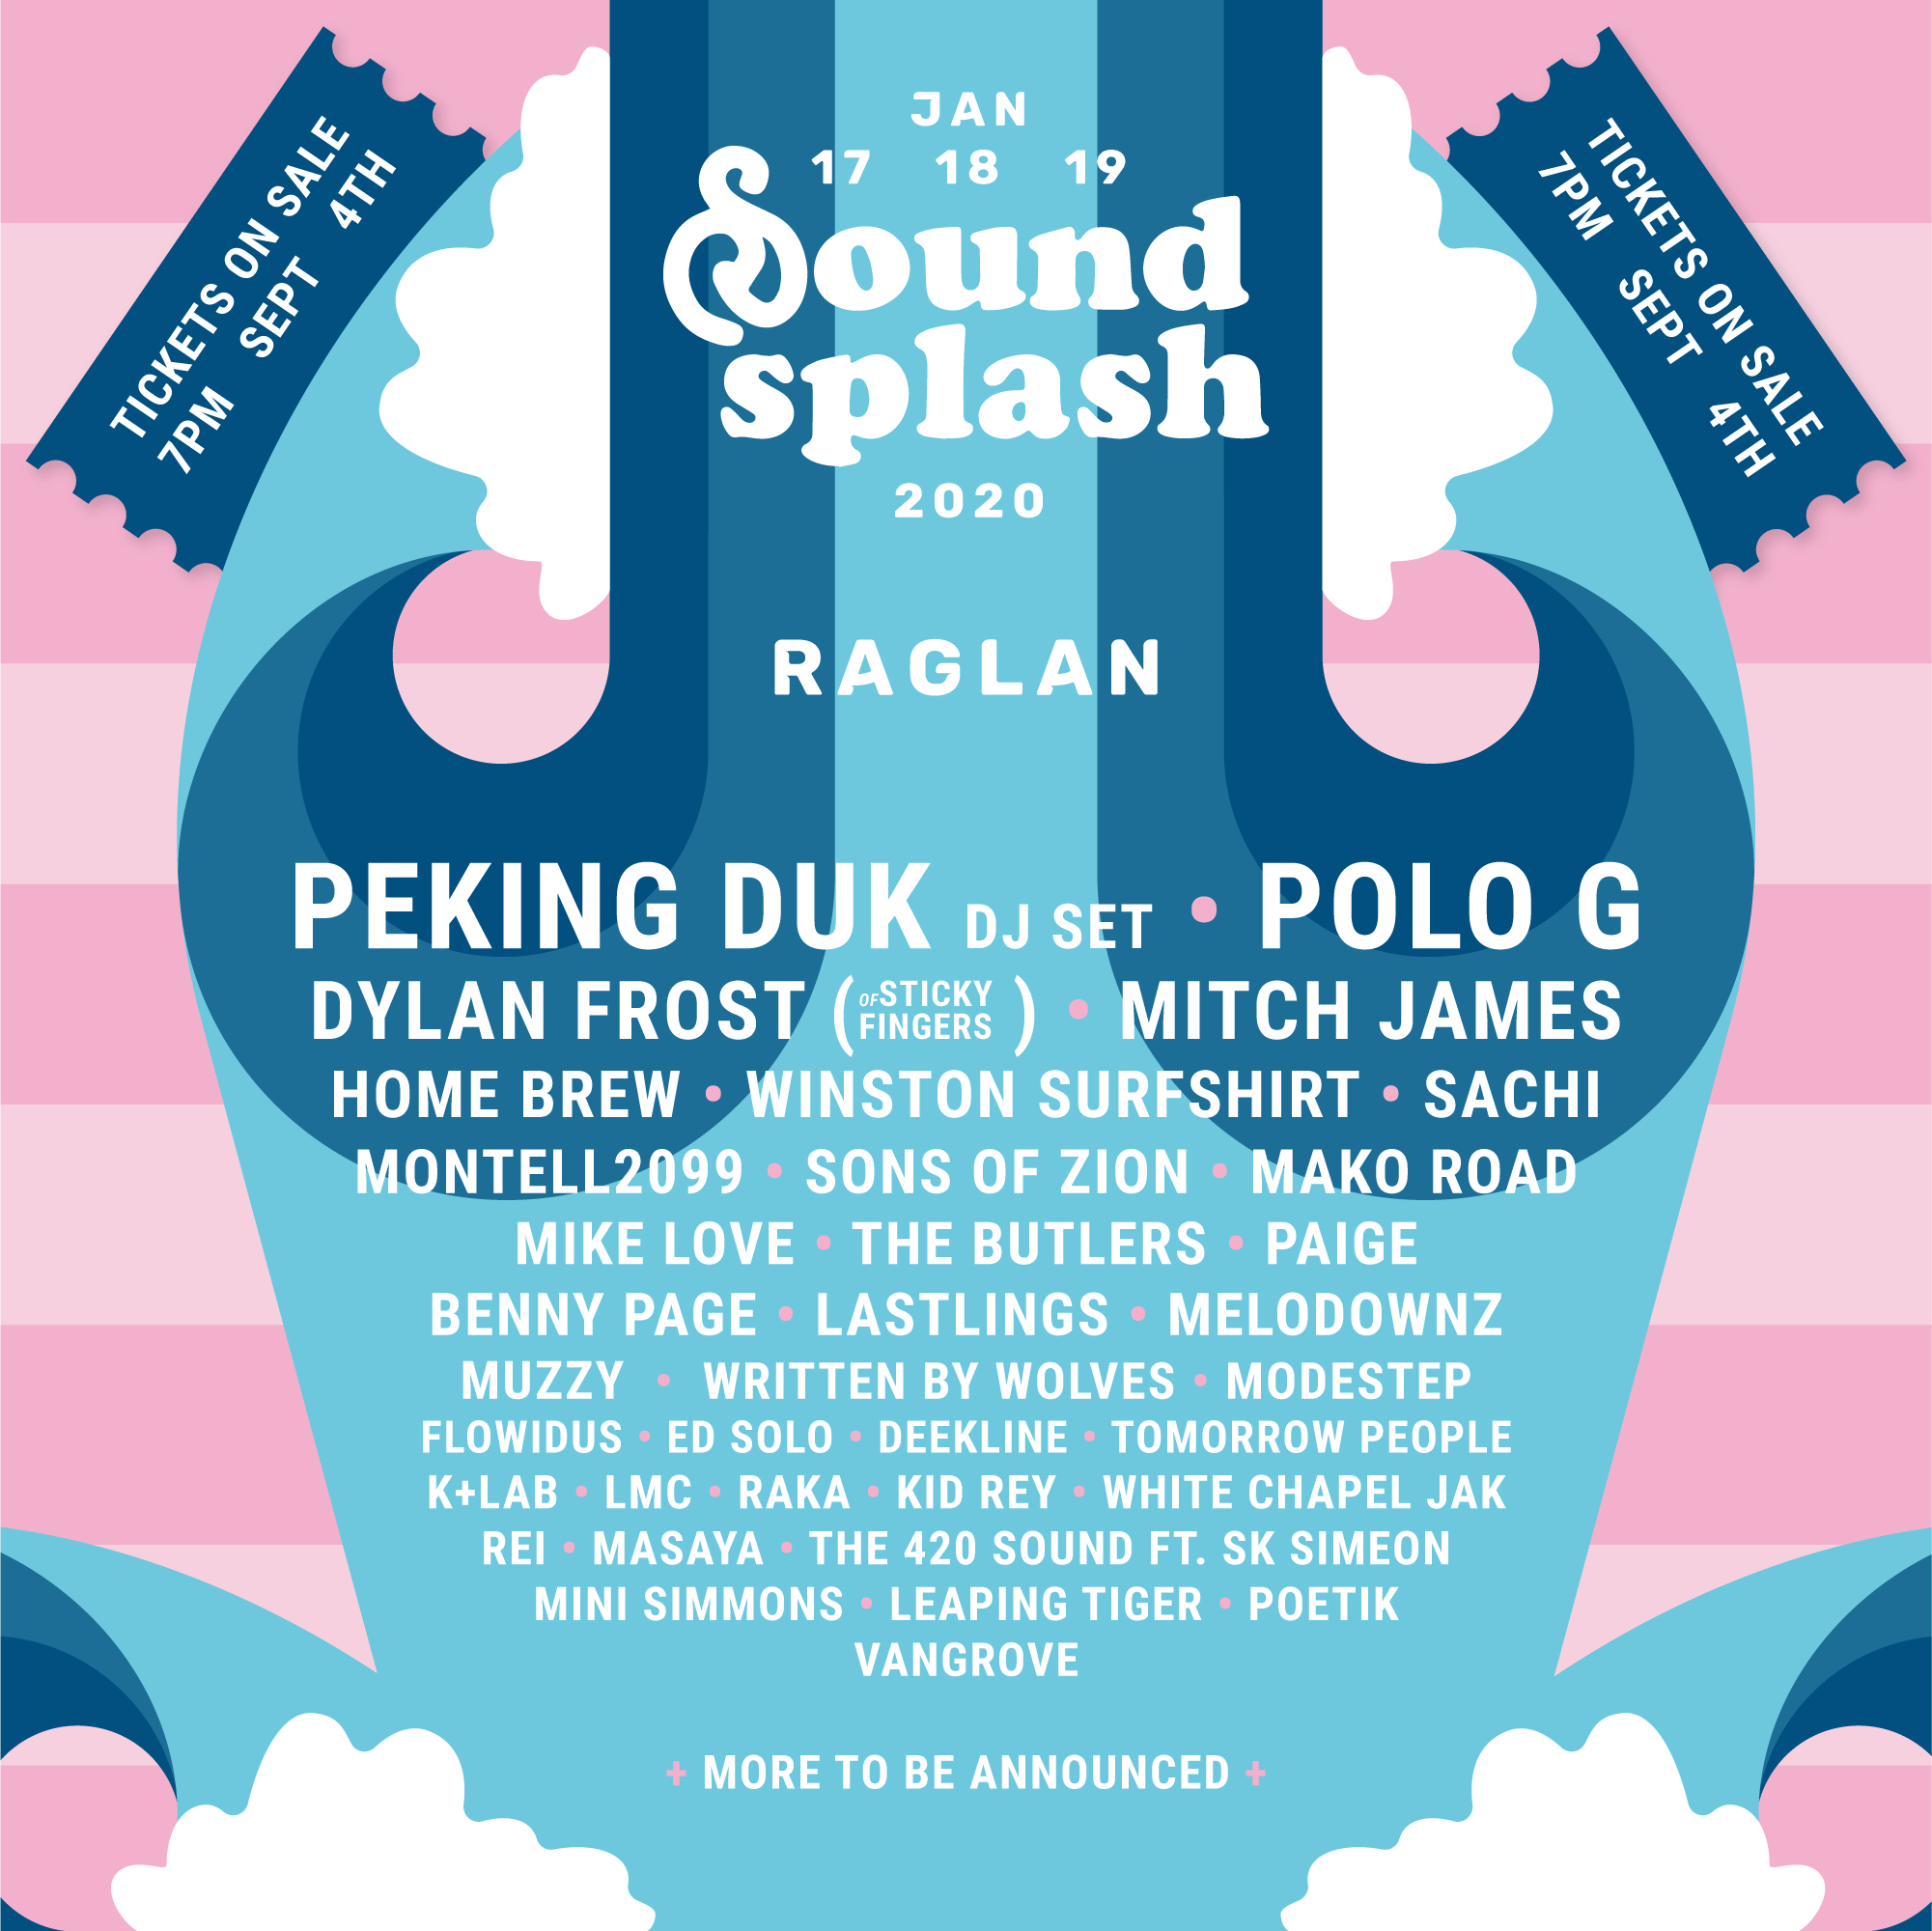 splash 2020 acts